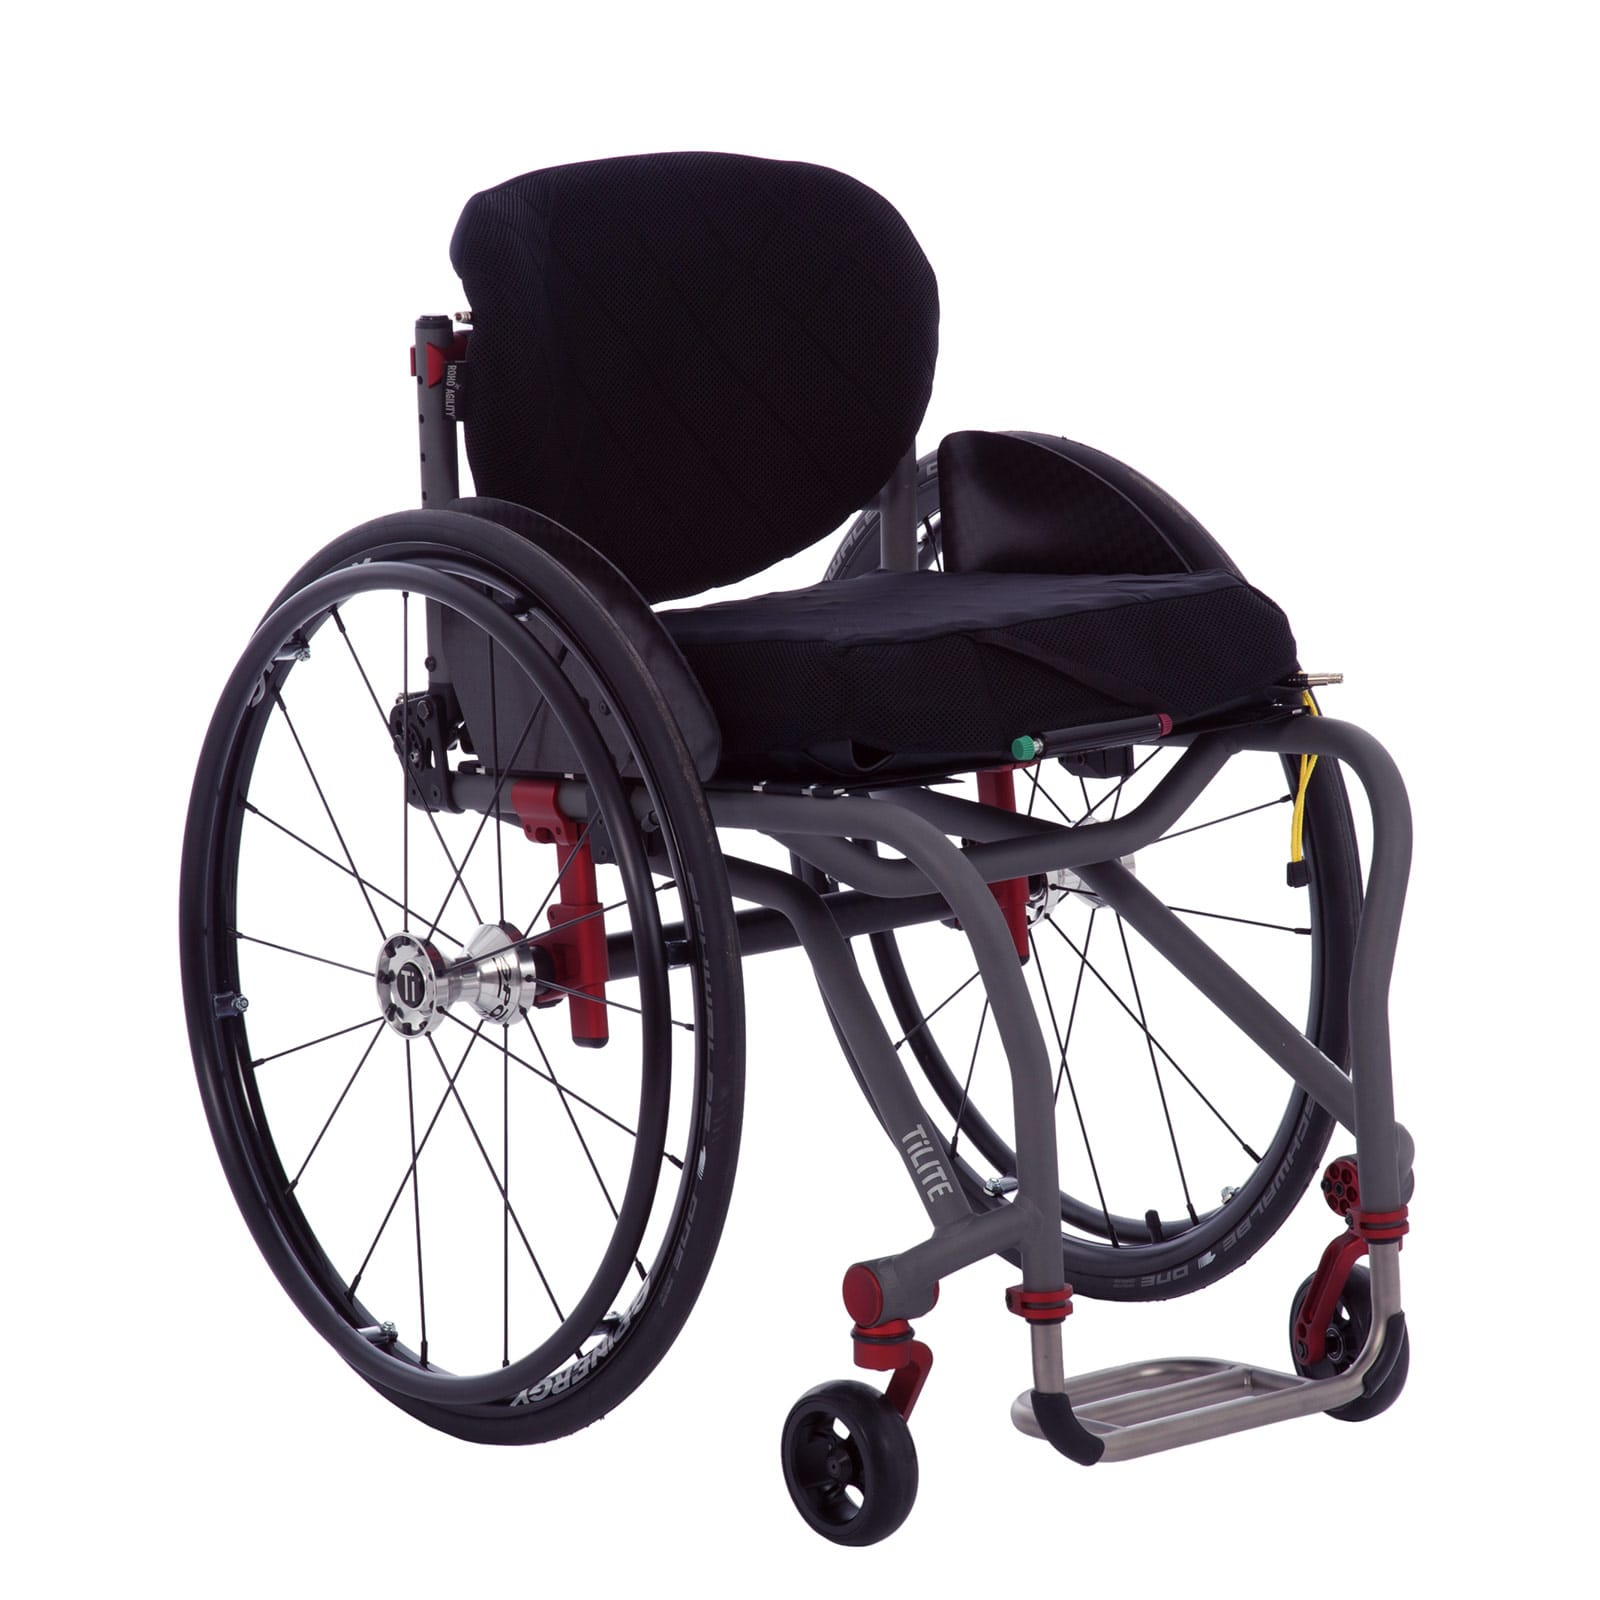 TiLite AeroT Manual Wheelchair